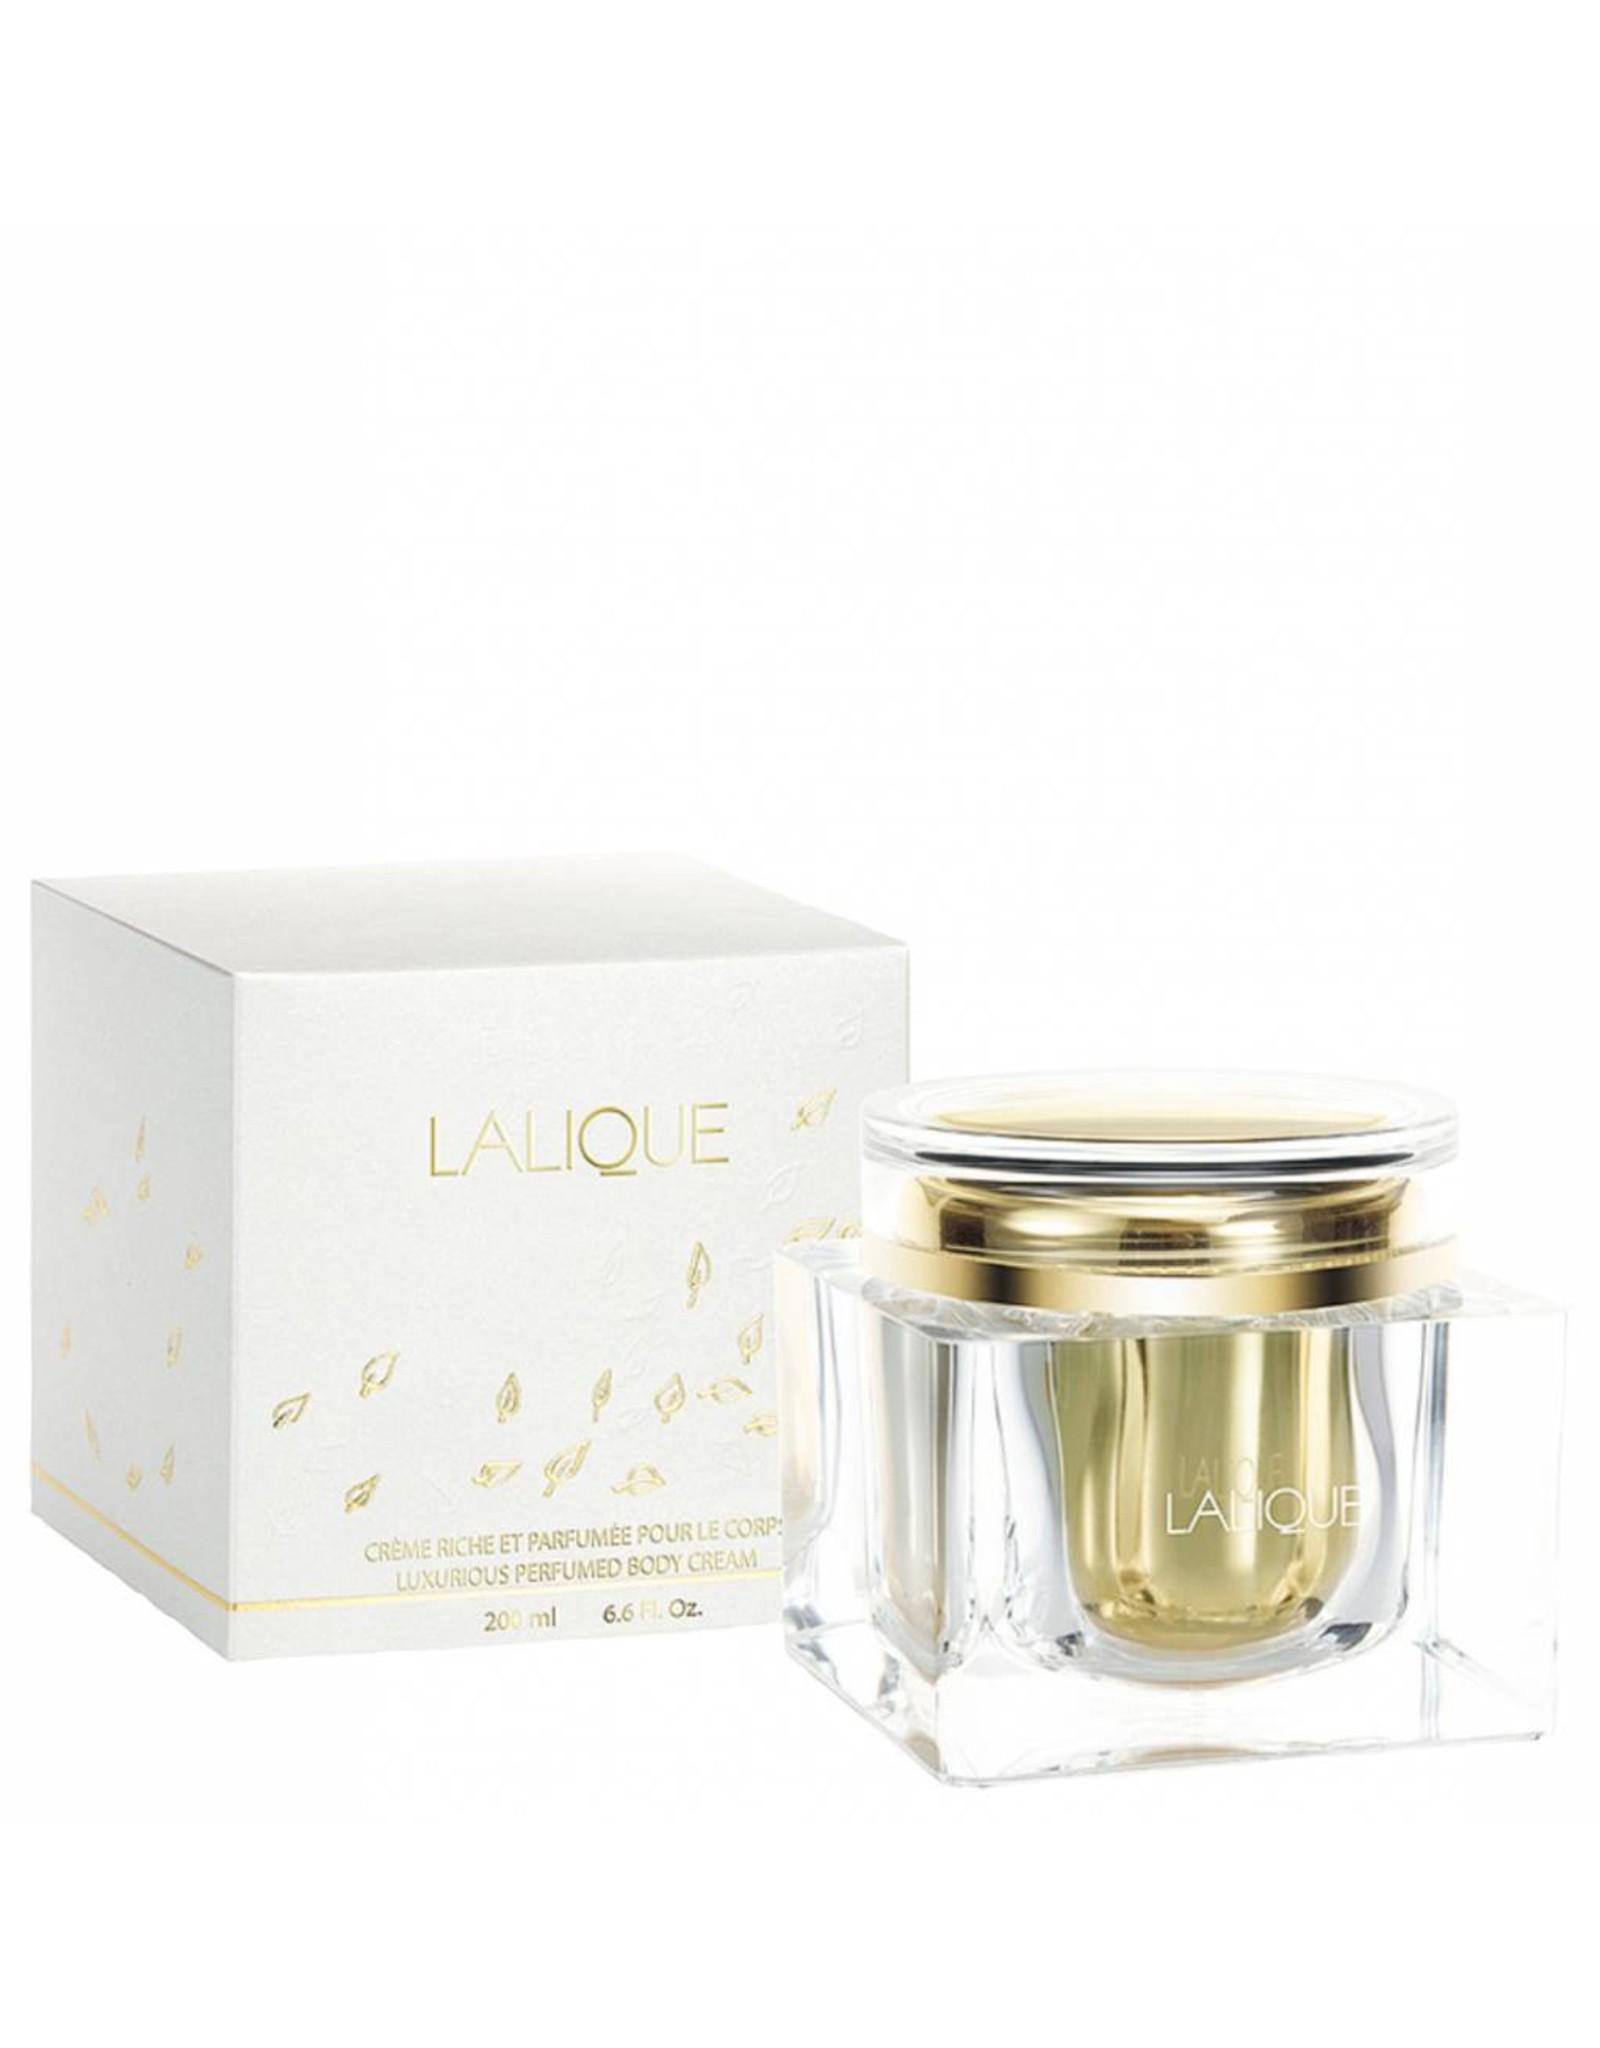 Lalique Lalique de Lalique - Body Cream